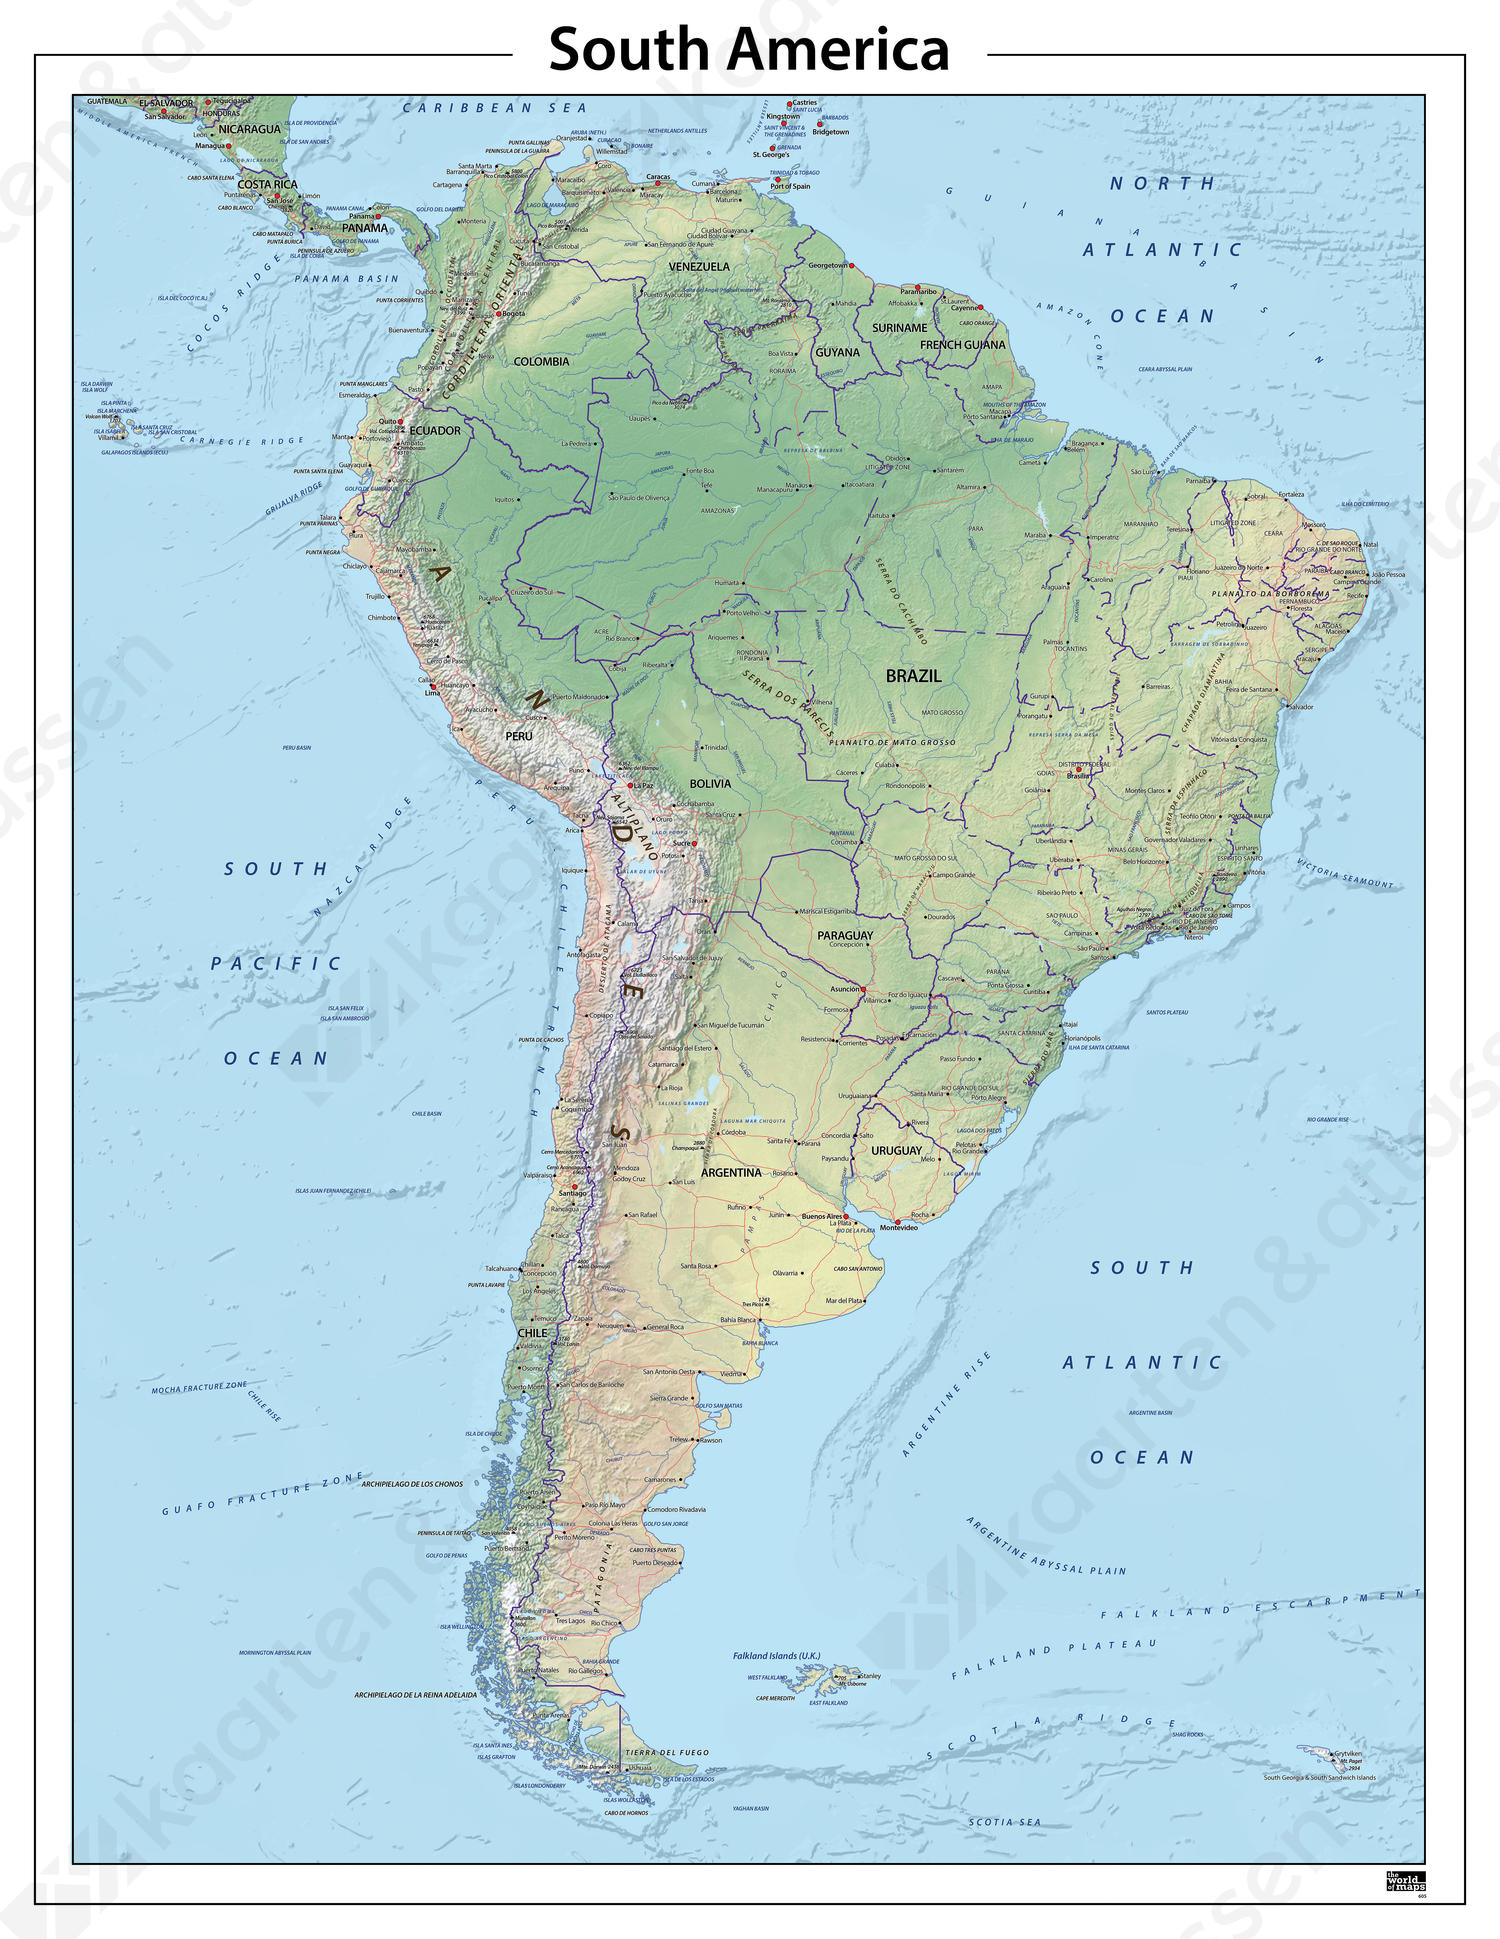 Zuid Amerika natuurkundige kaart